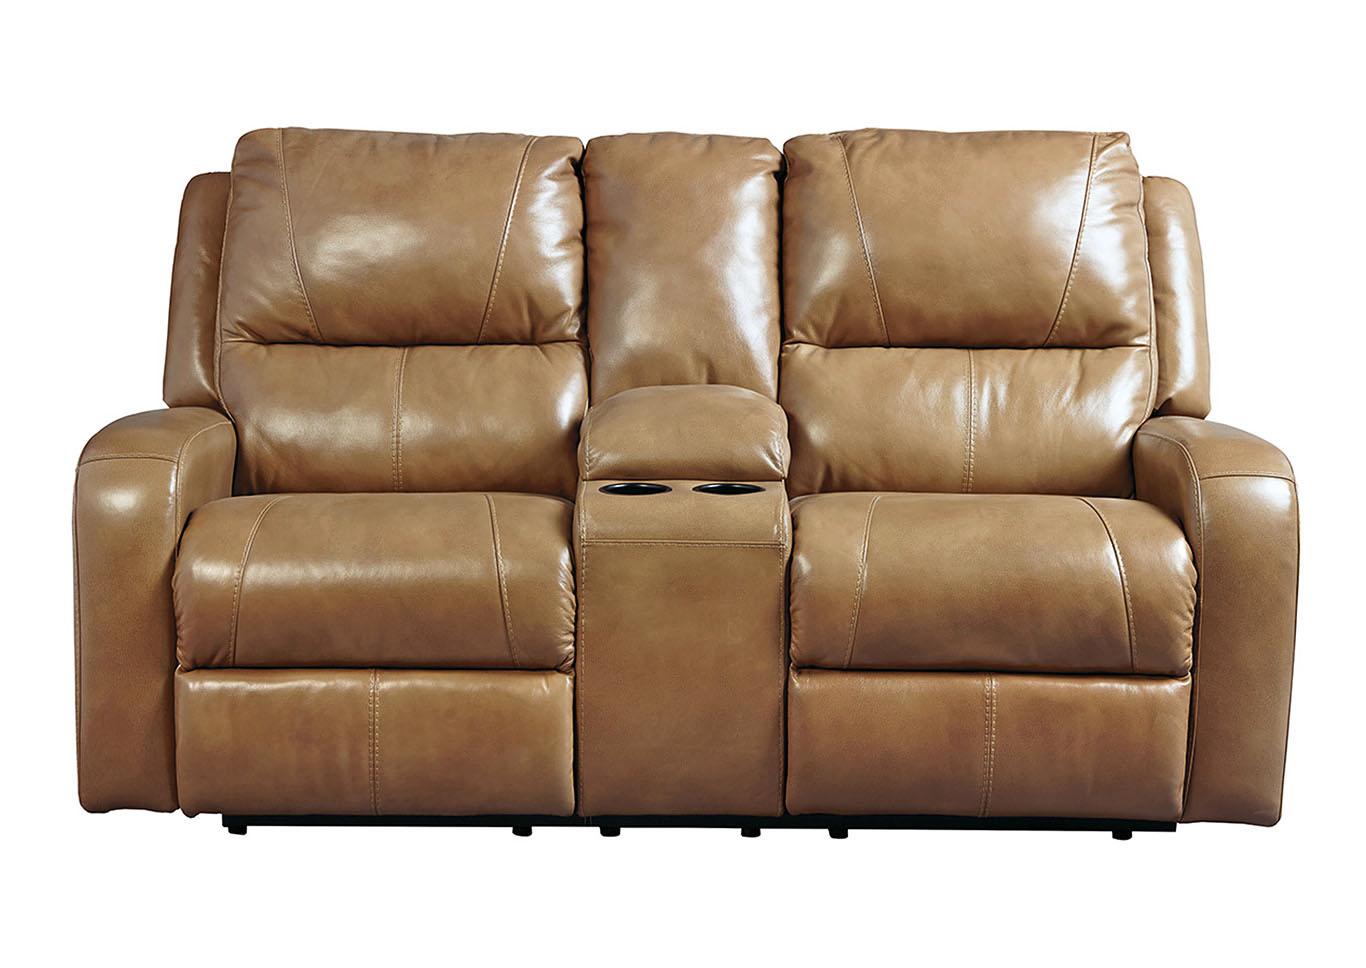 in home furniture roogan blondie double reclining loveseat w